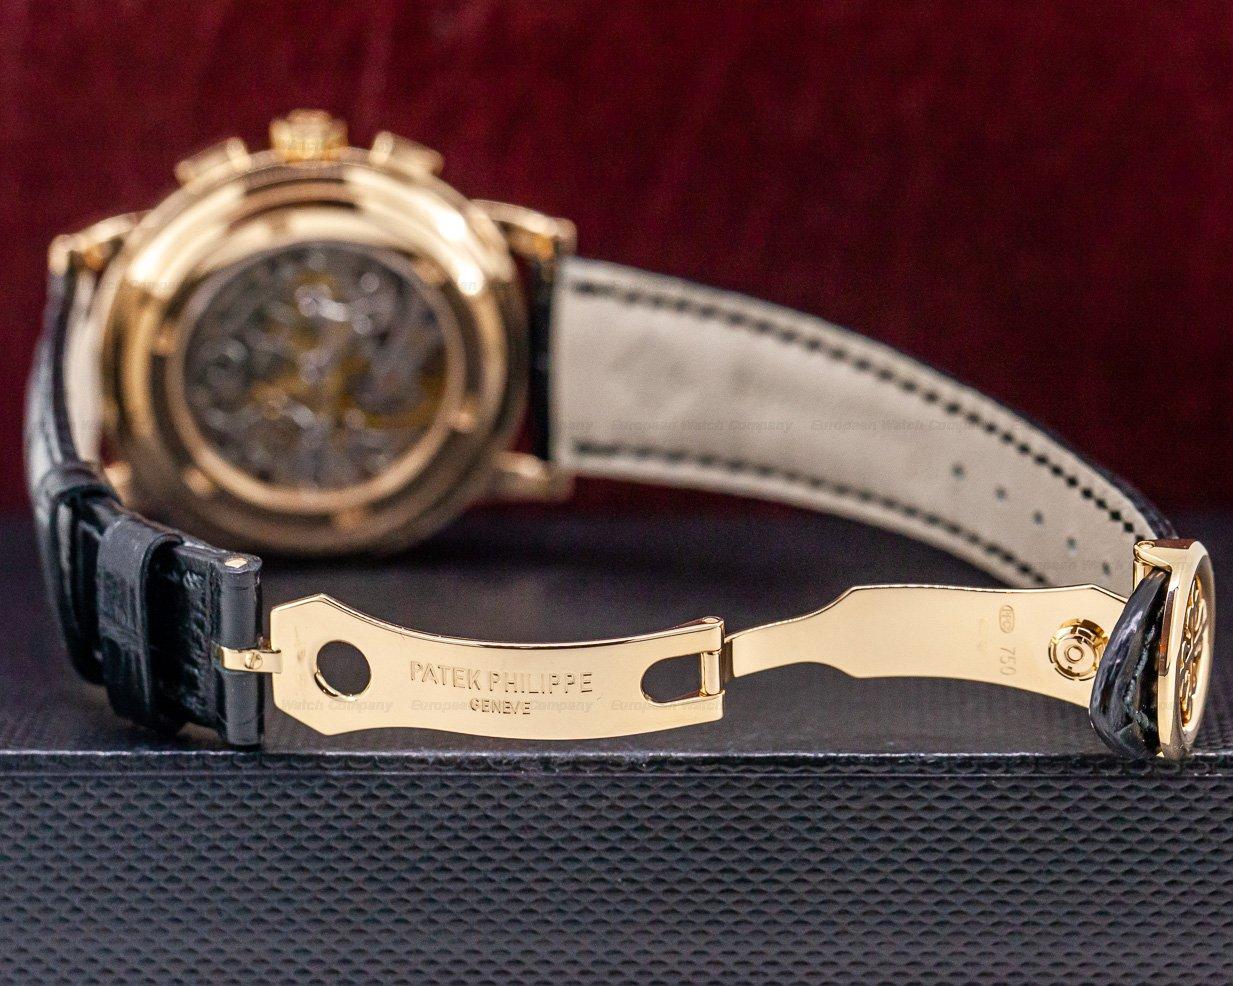 Patek Philippe 5070R 5070 Rose Gold Lemania Chronograph / Silver Dial